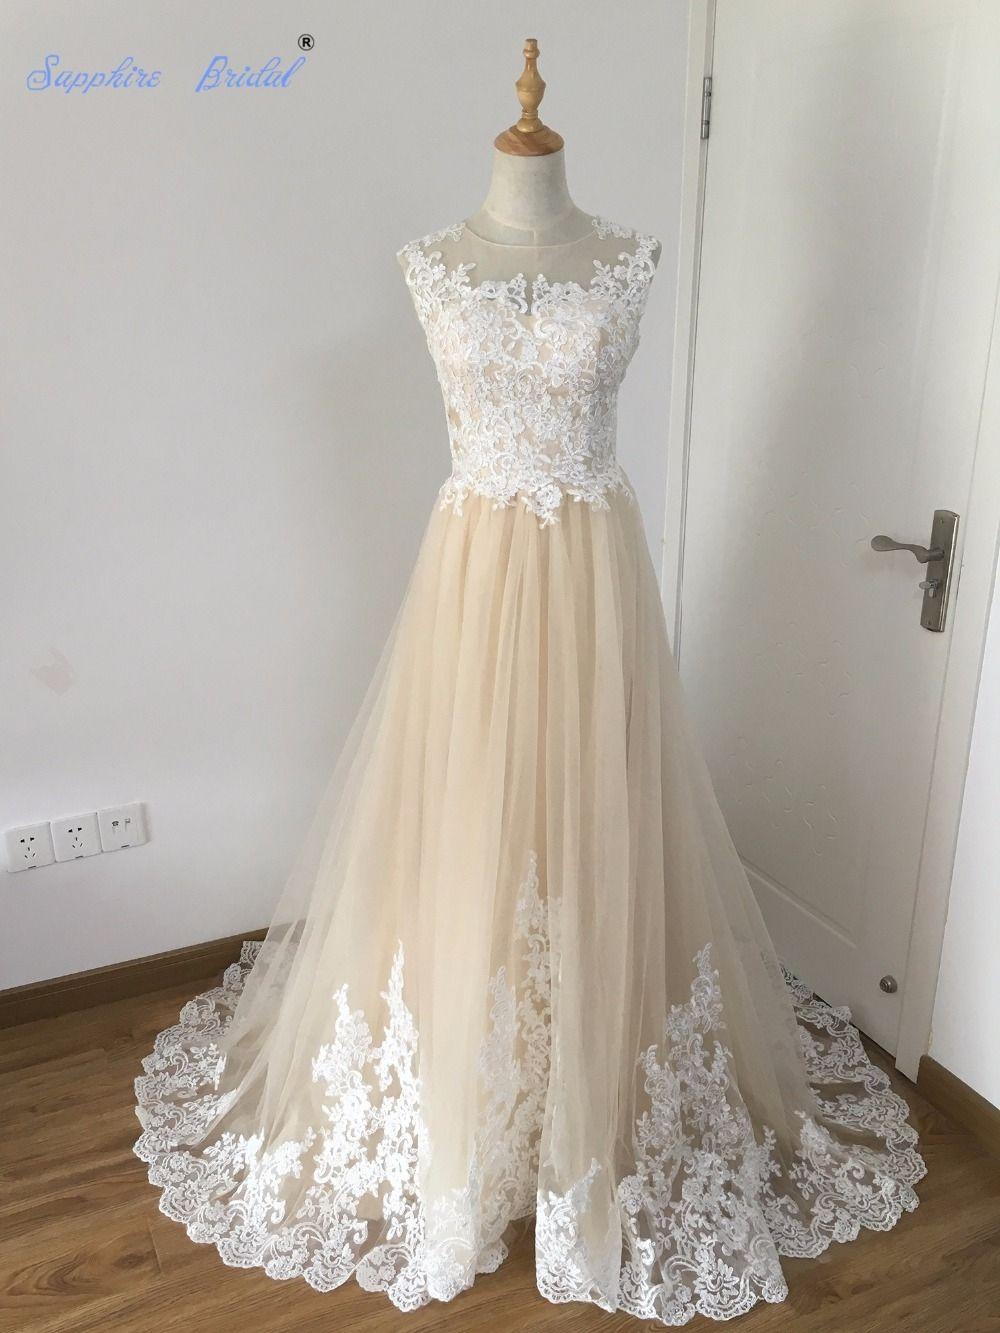 Champagne and ivory wedding dress  Sapphire Bridal  Real Photo Vestido De Noiva Champagne White